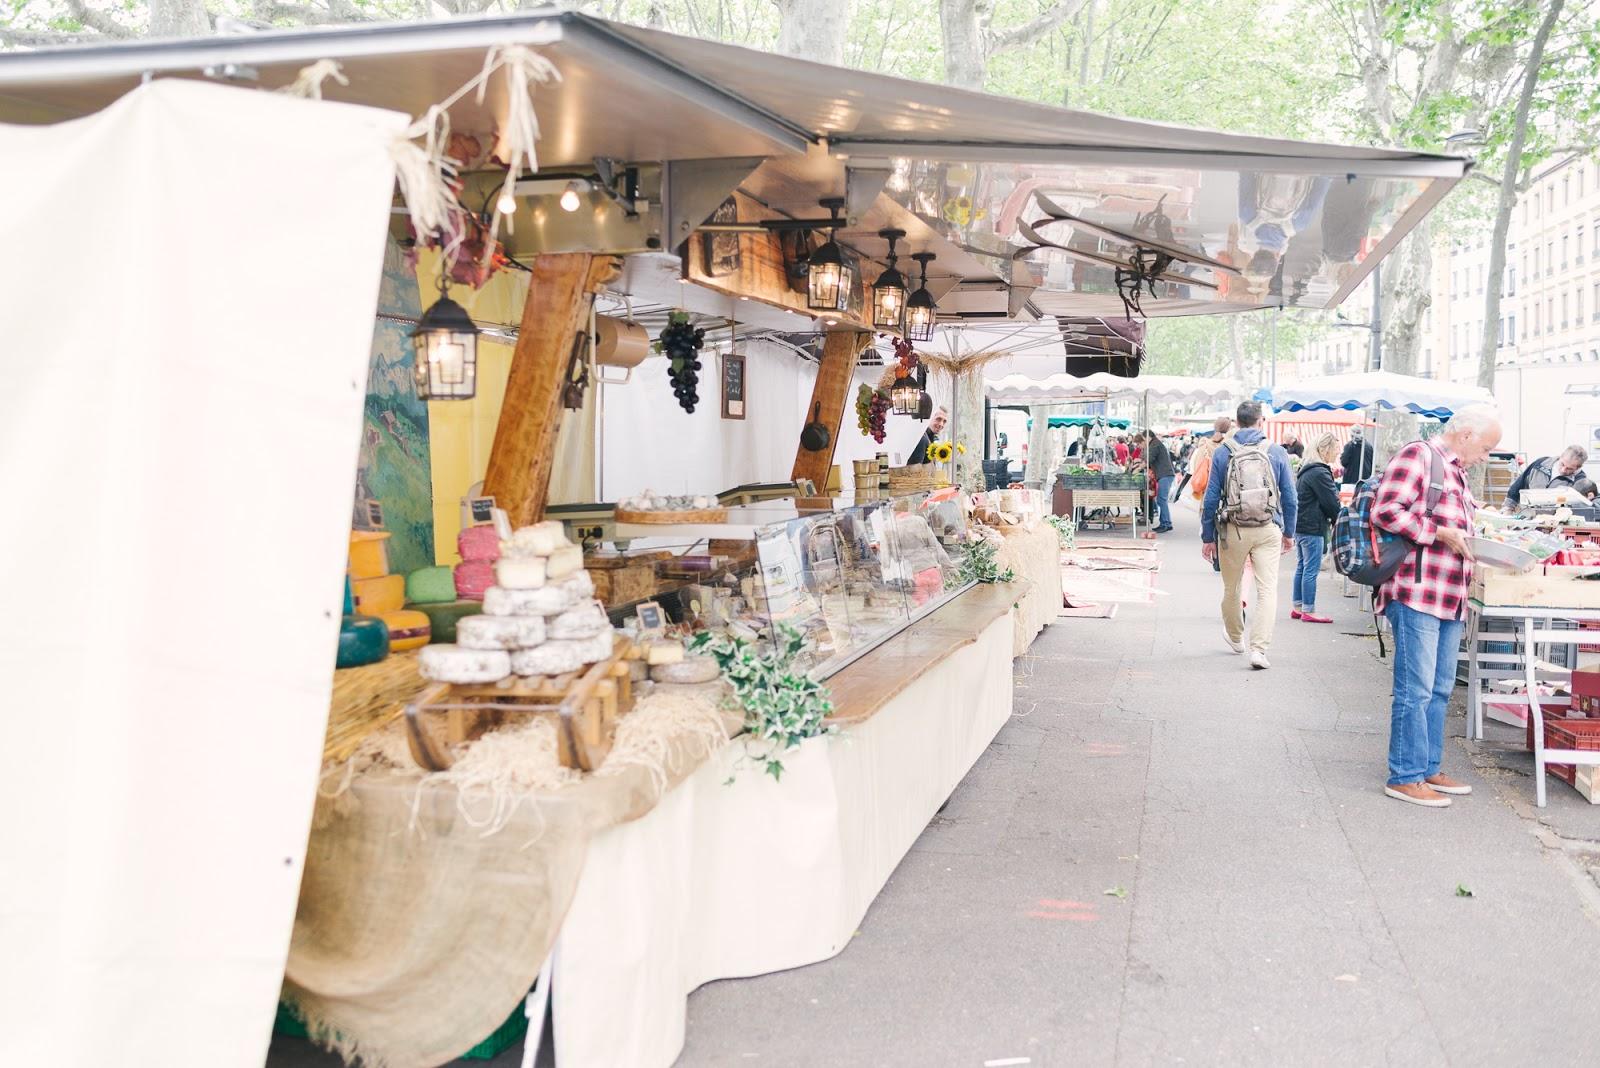 Alex Good-Beautyosaurus Lex-Travel-Farmers Market-France-Lyon-Spring-Marché Saint-Antoine Lyon, France